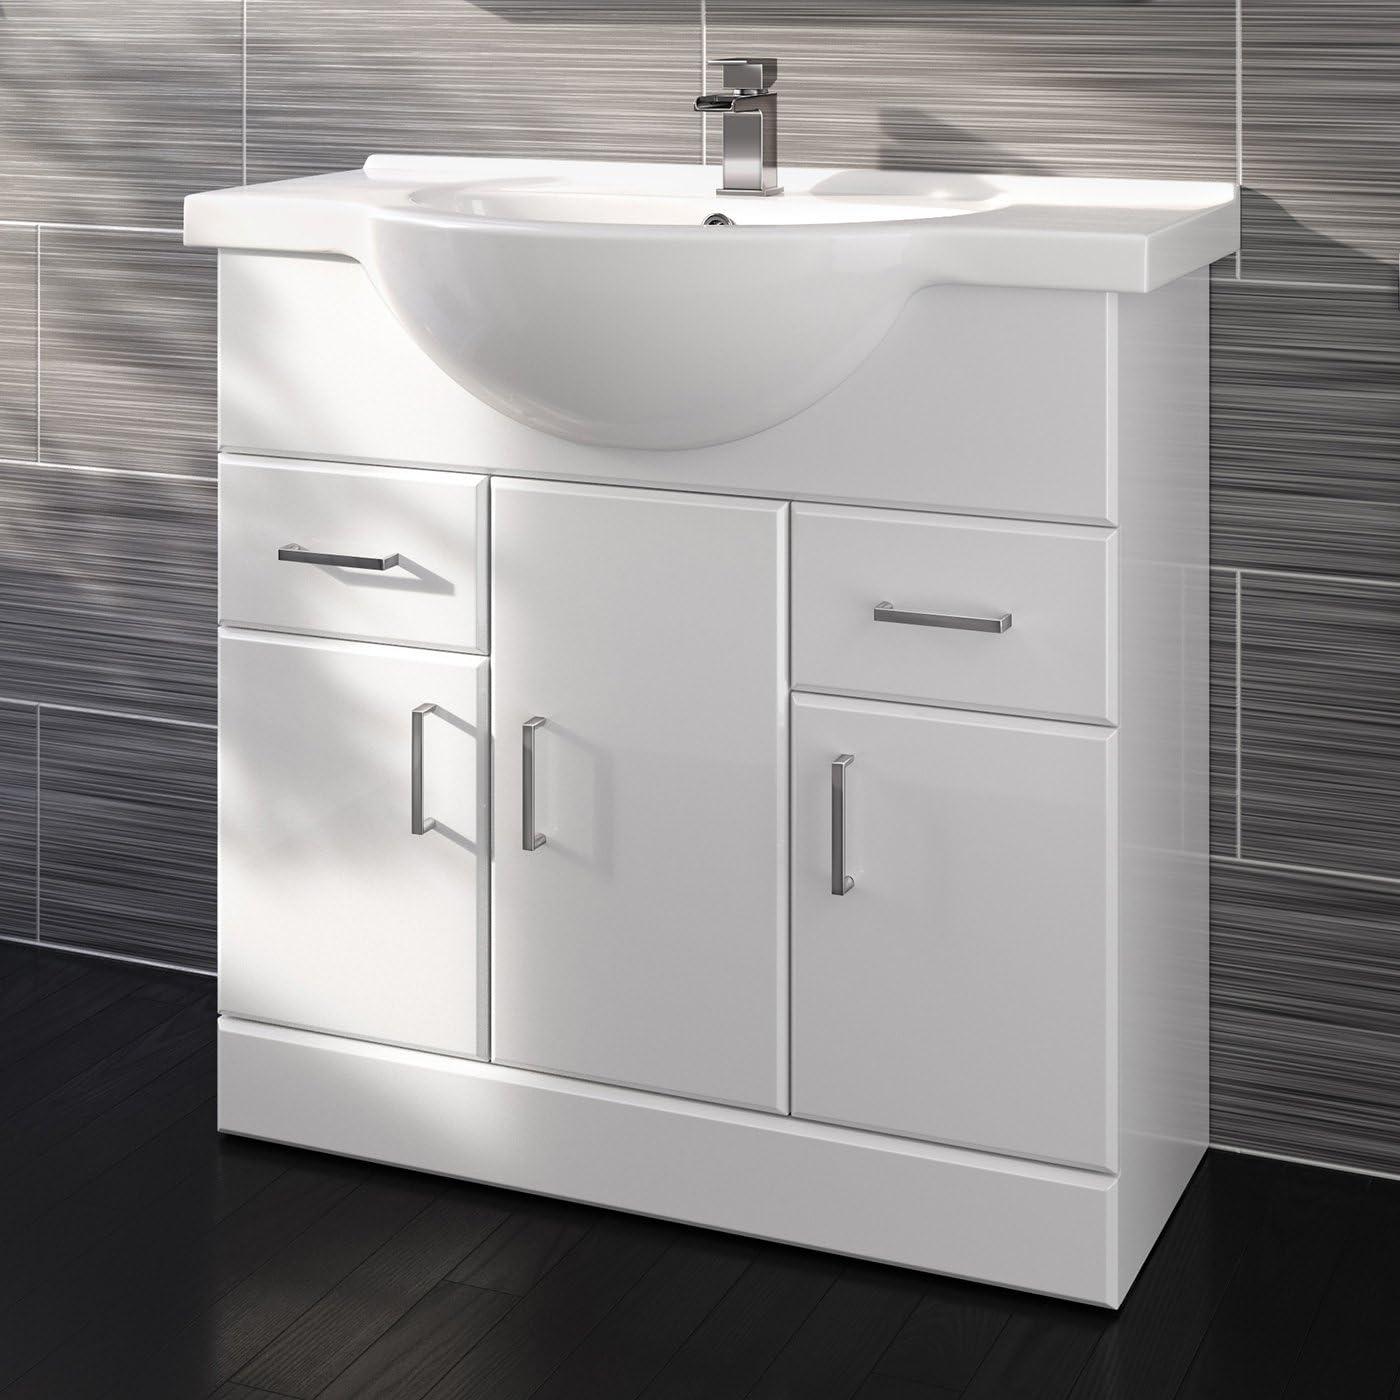 850mm White Gloss Basin Vanity Cabinet Bathroom Storage Furniture Sink Unit